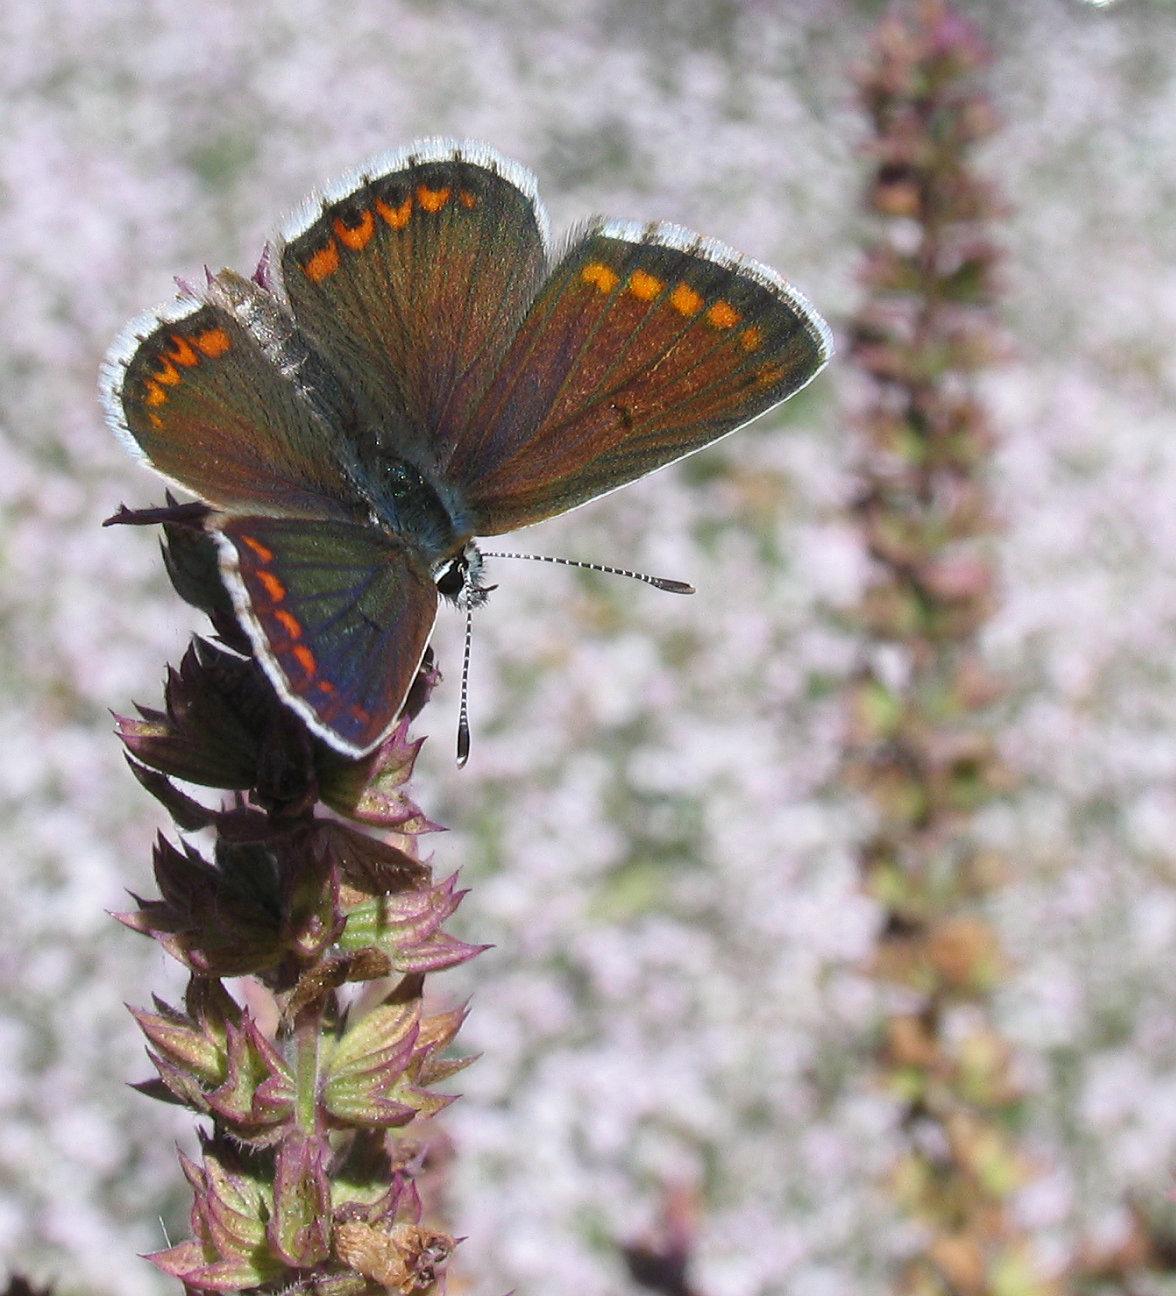 Rødplettet blåfugl, Aricia agestis